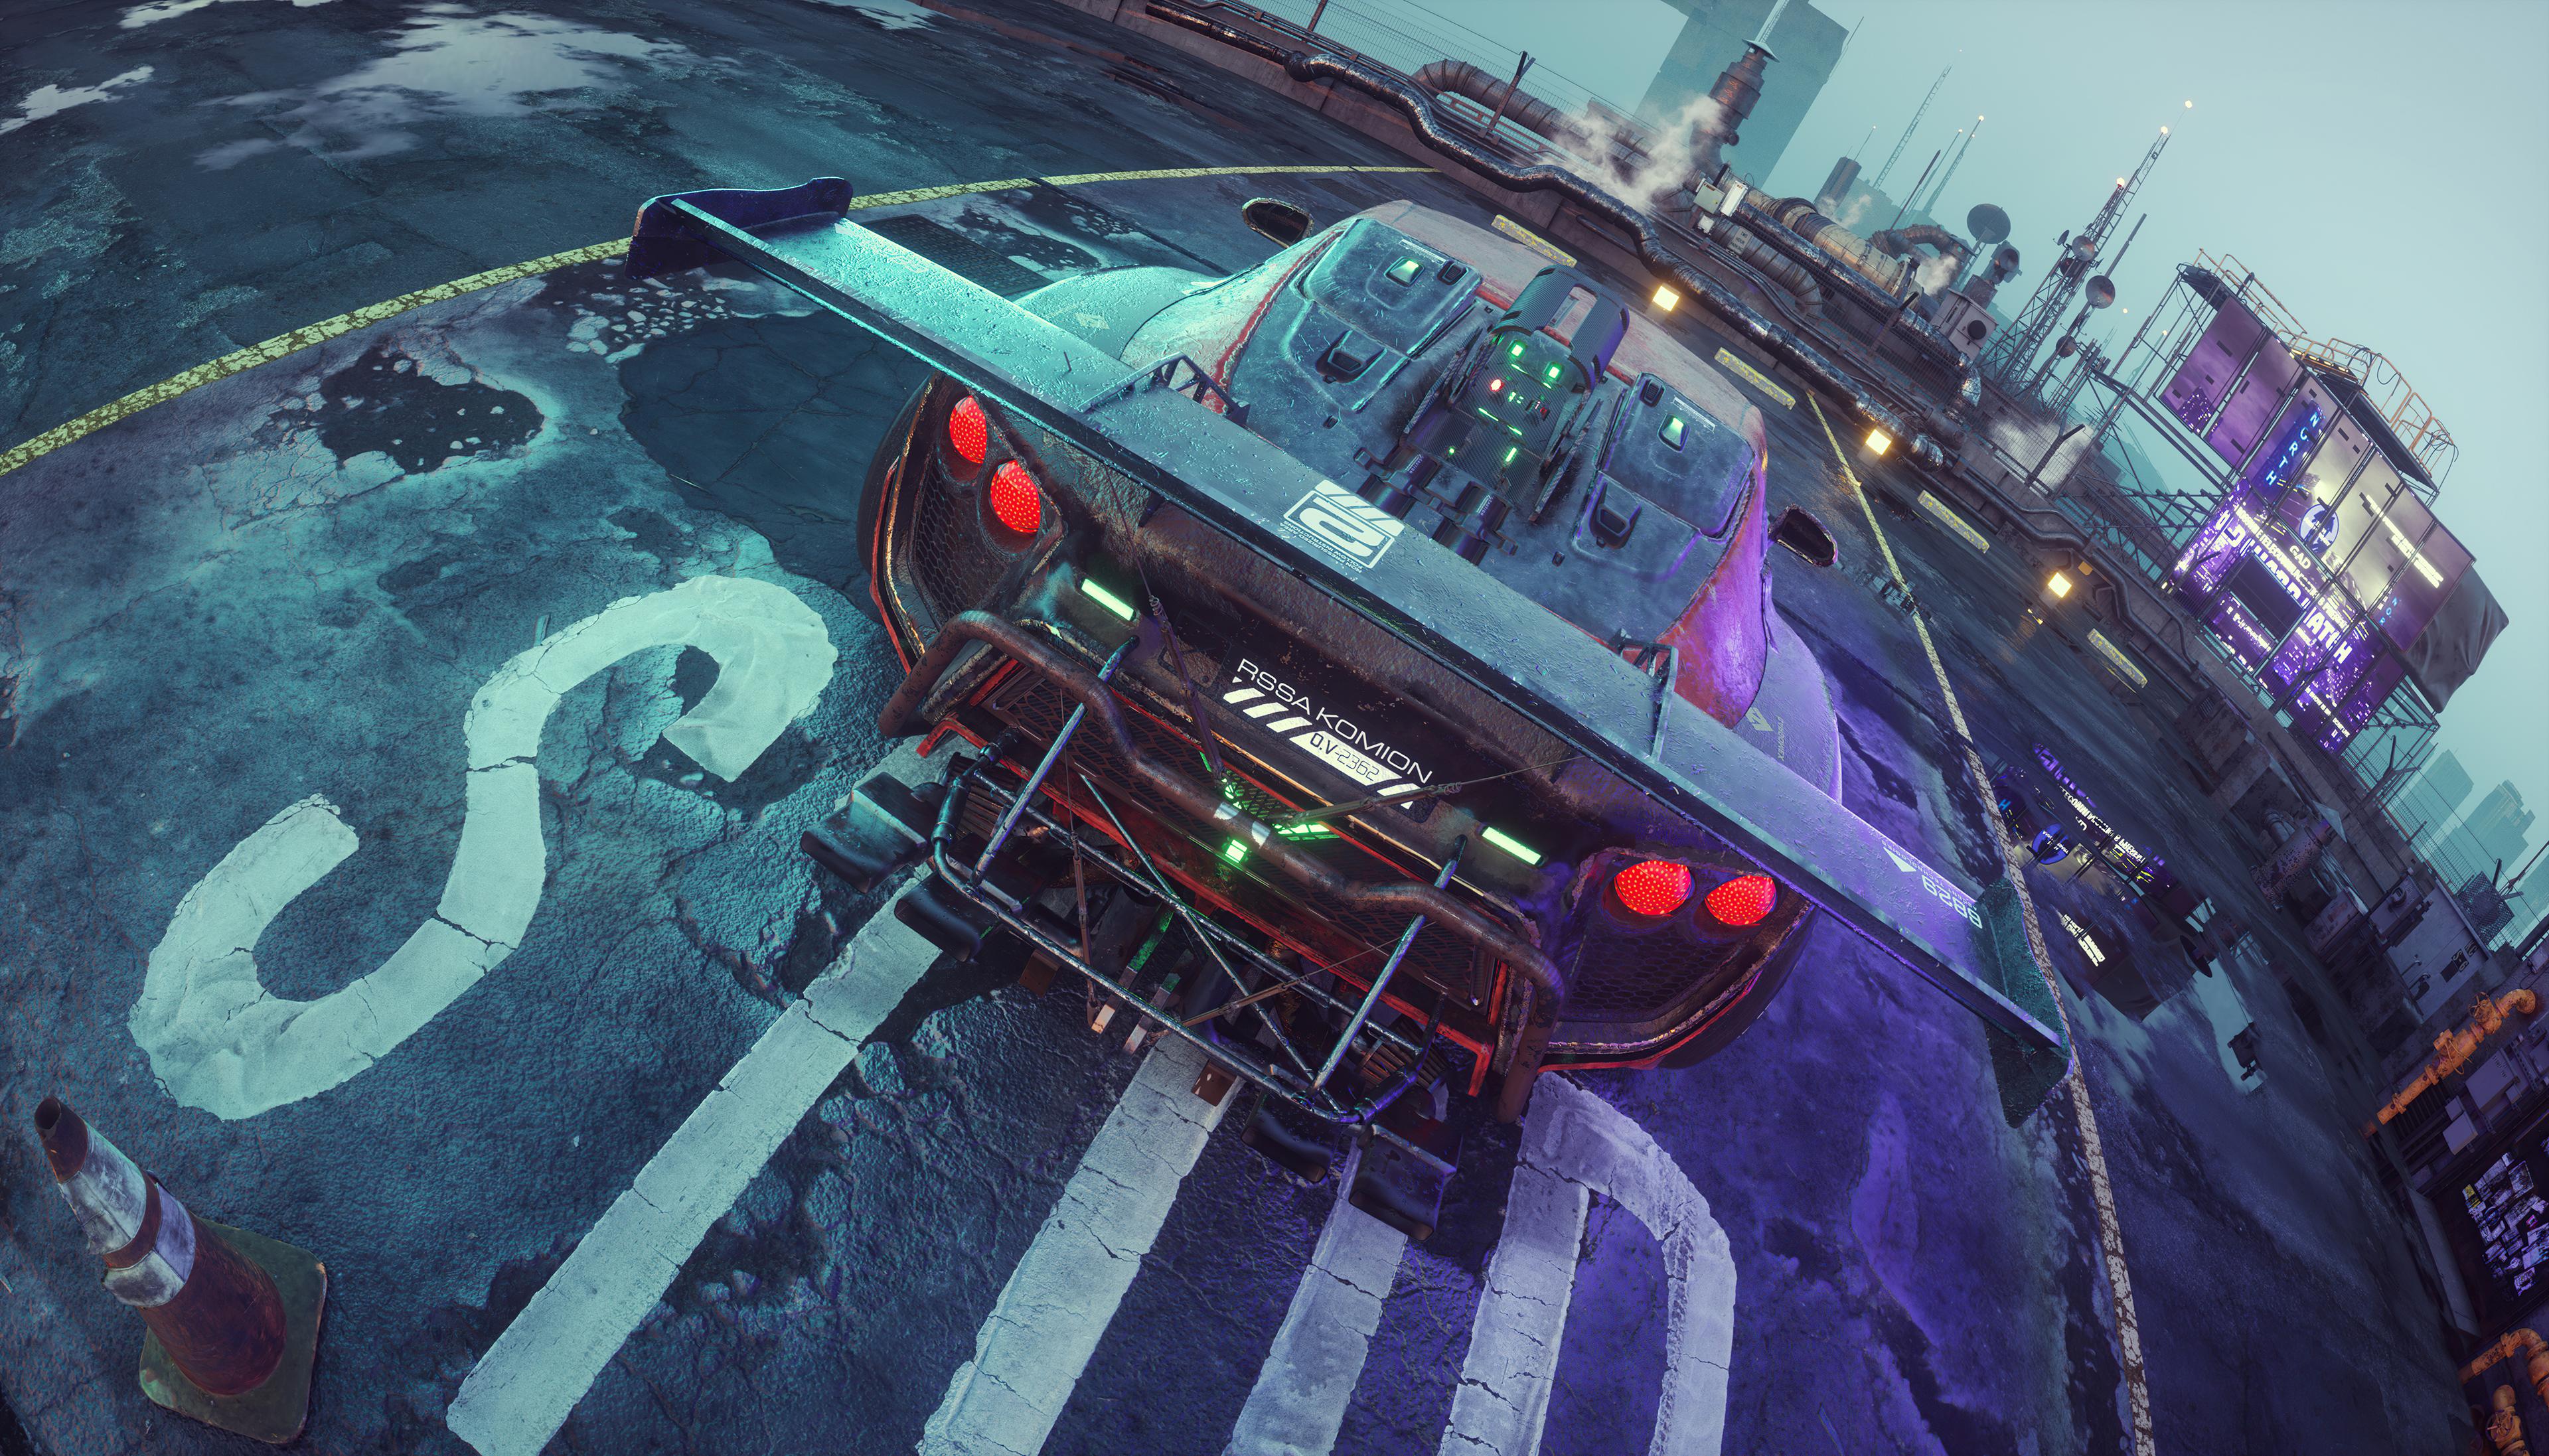 cyberpunkish flanker f concept car 4k 1620170556 - Cyberpunkish Flanker F Concept Car 4k - Cyberpunkish Flanker F Concept Car 4k wallpapers